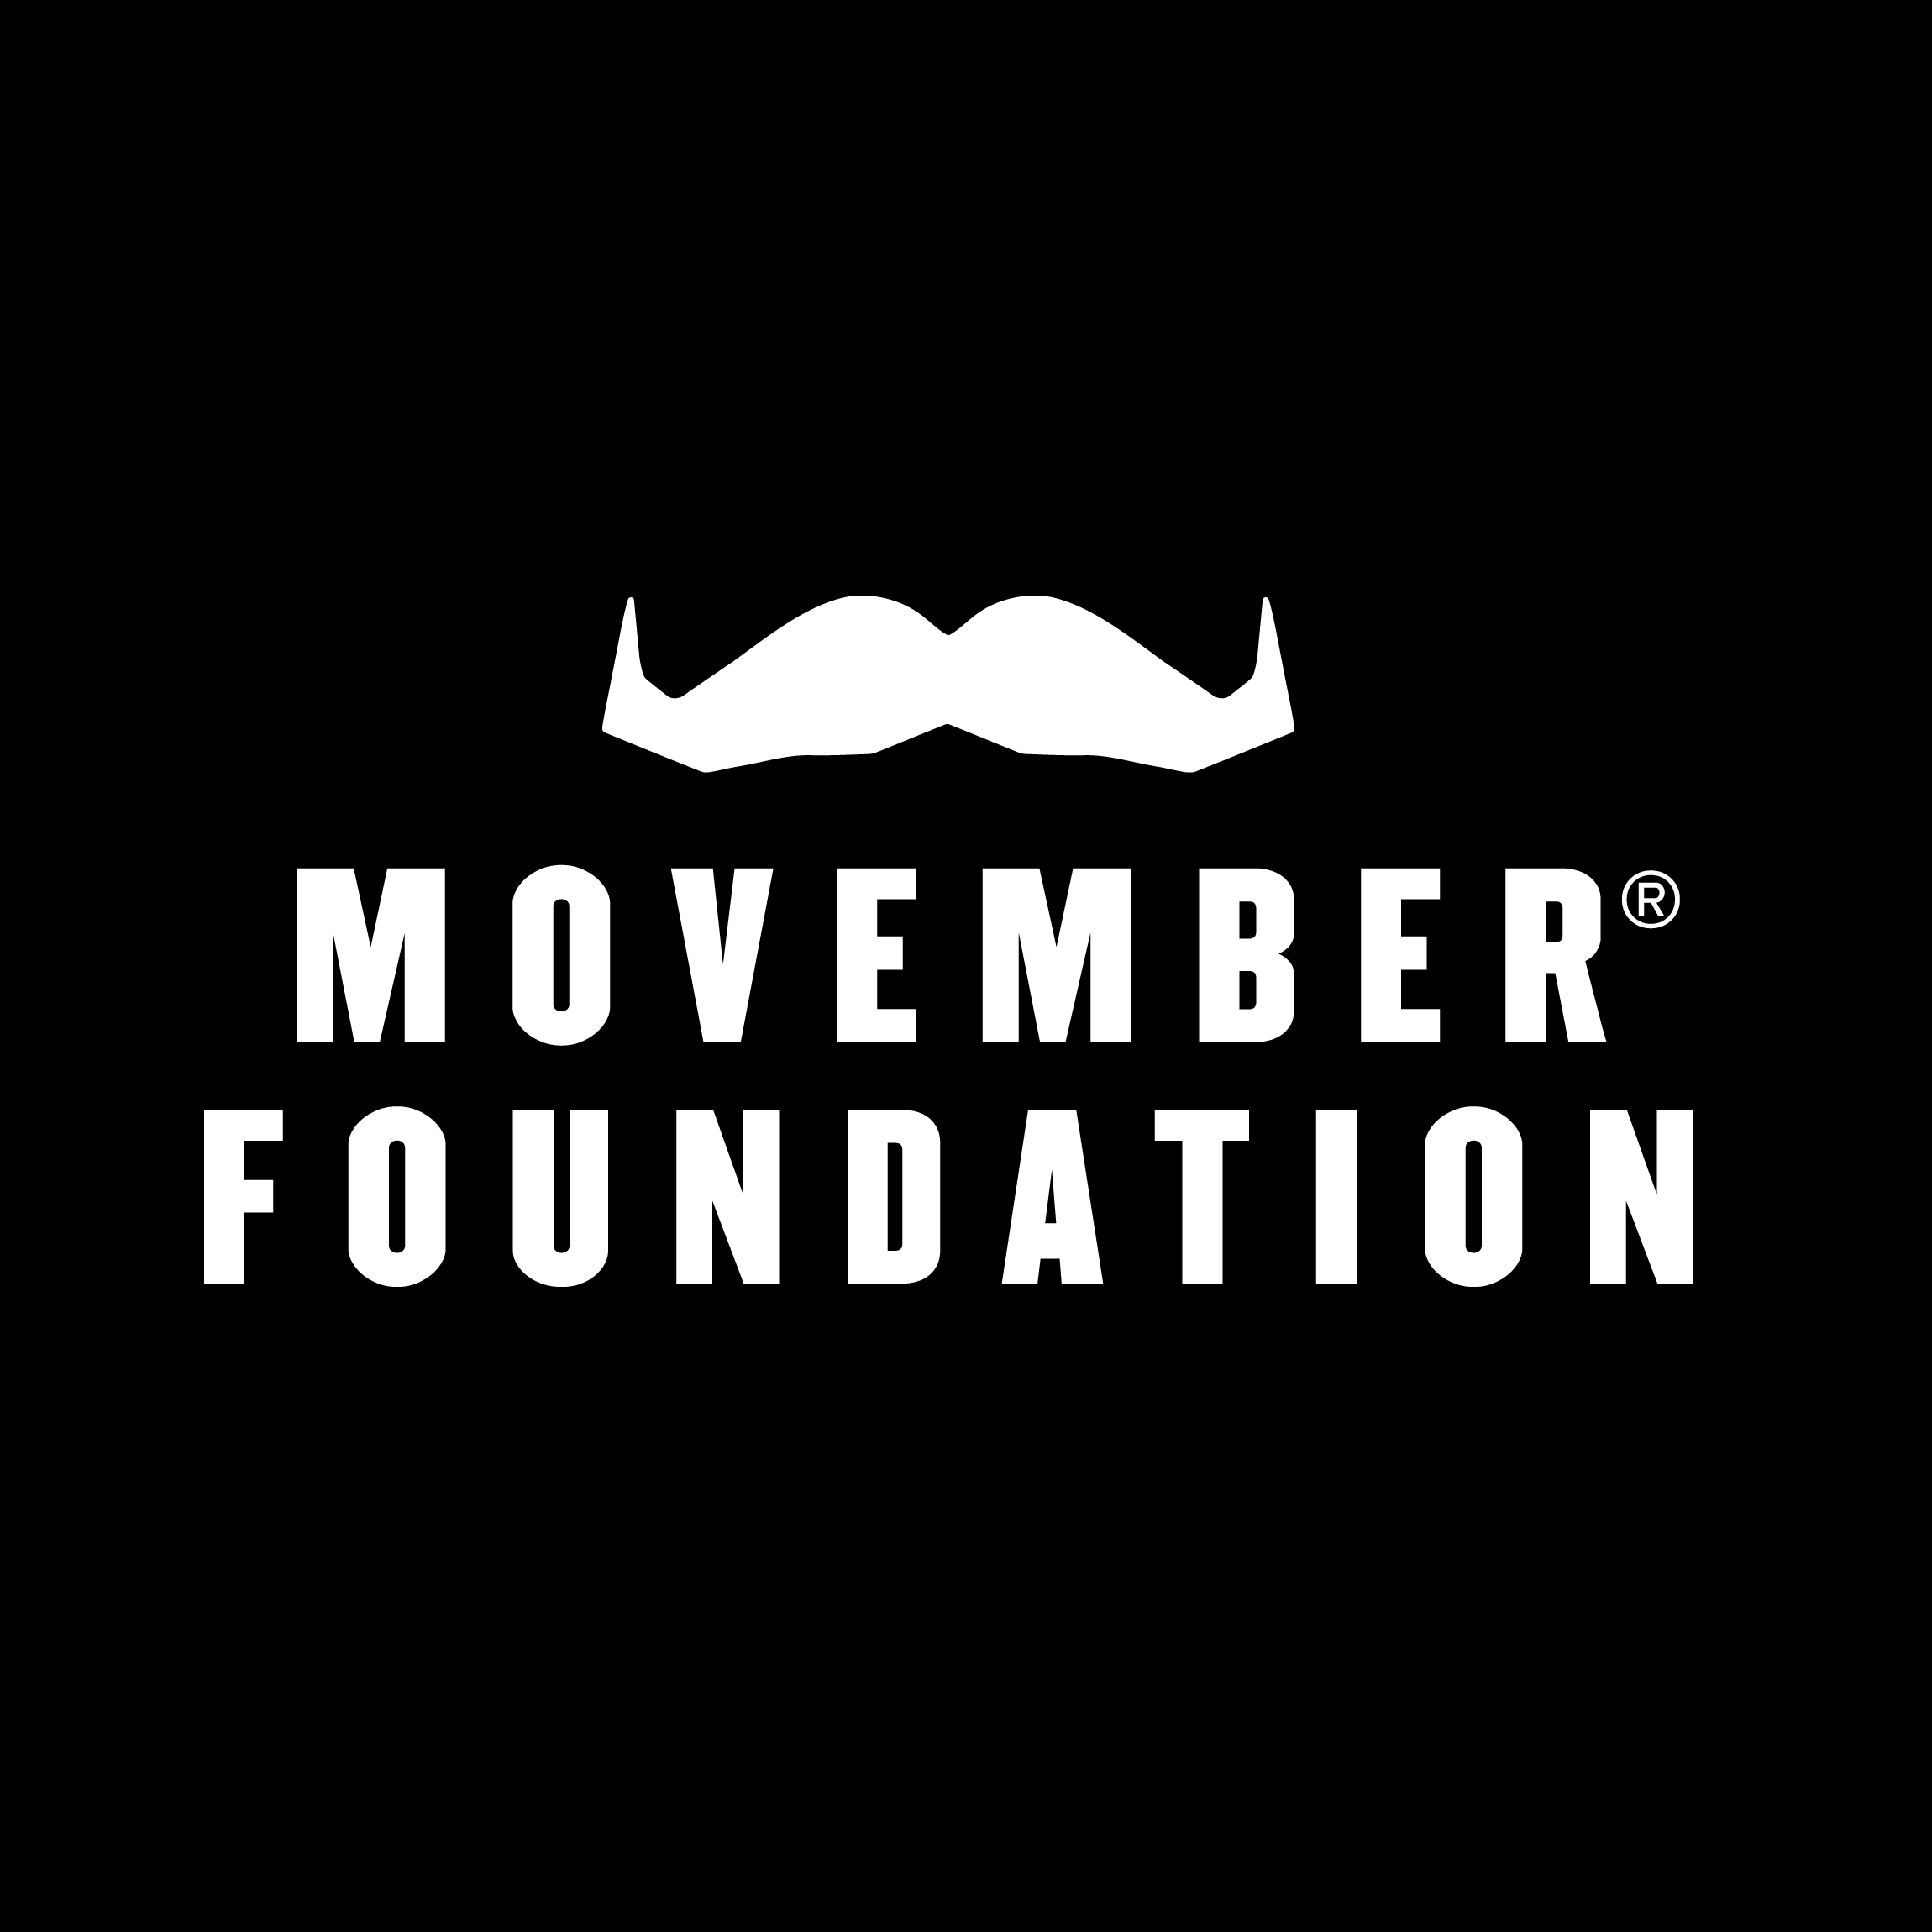 Movember - Wikipedia